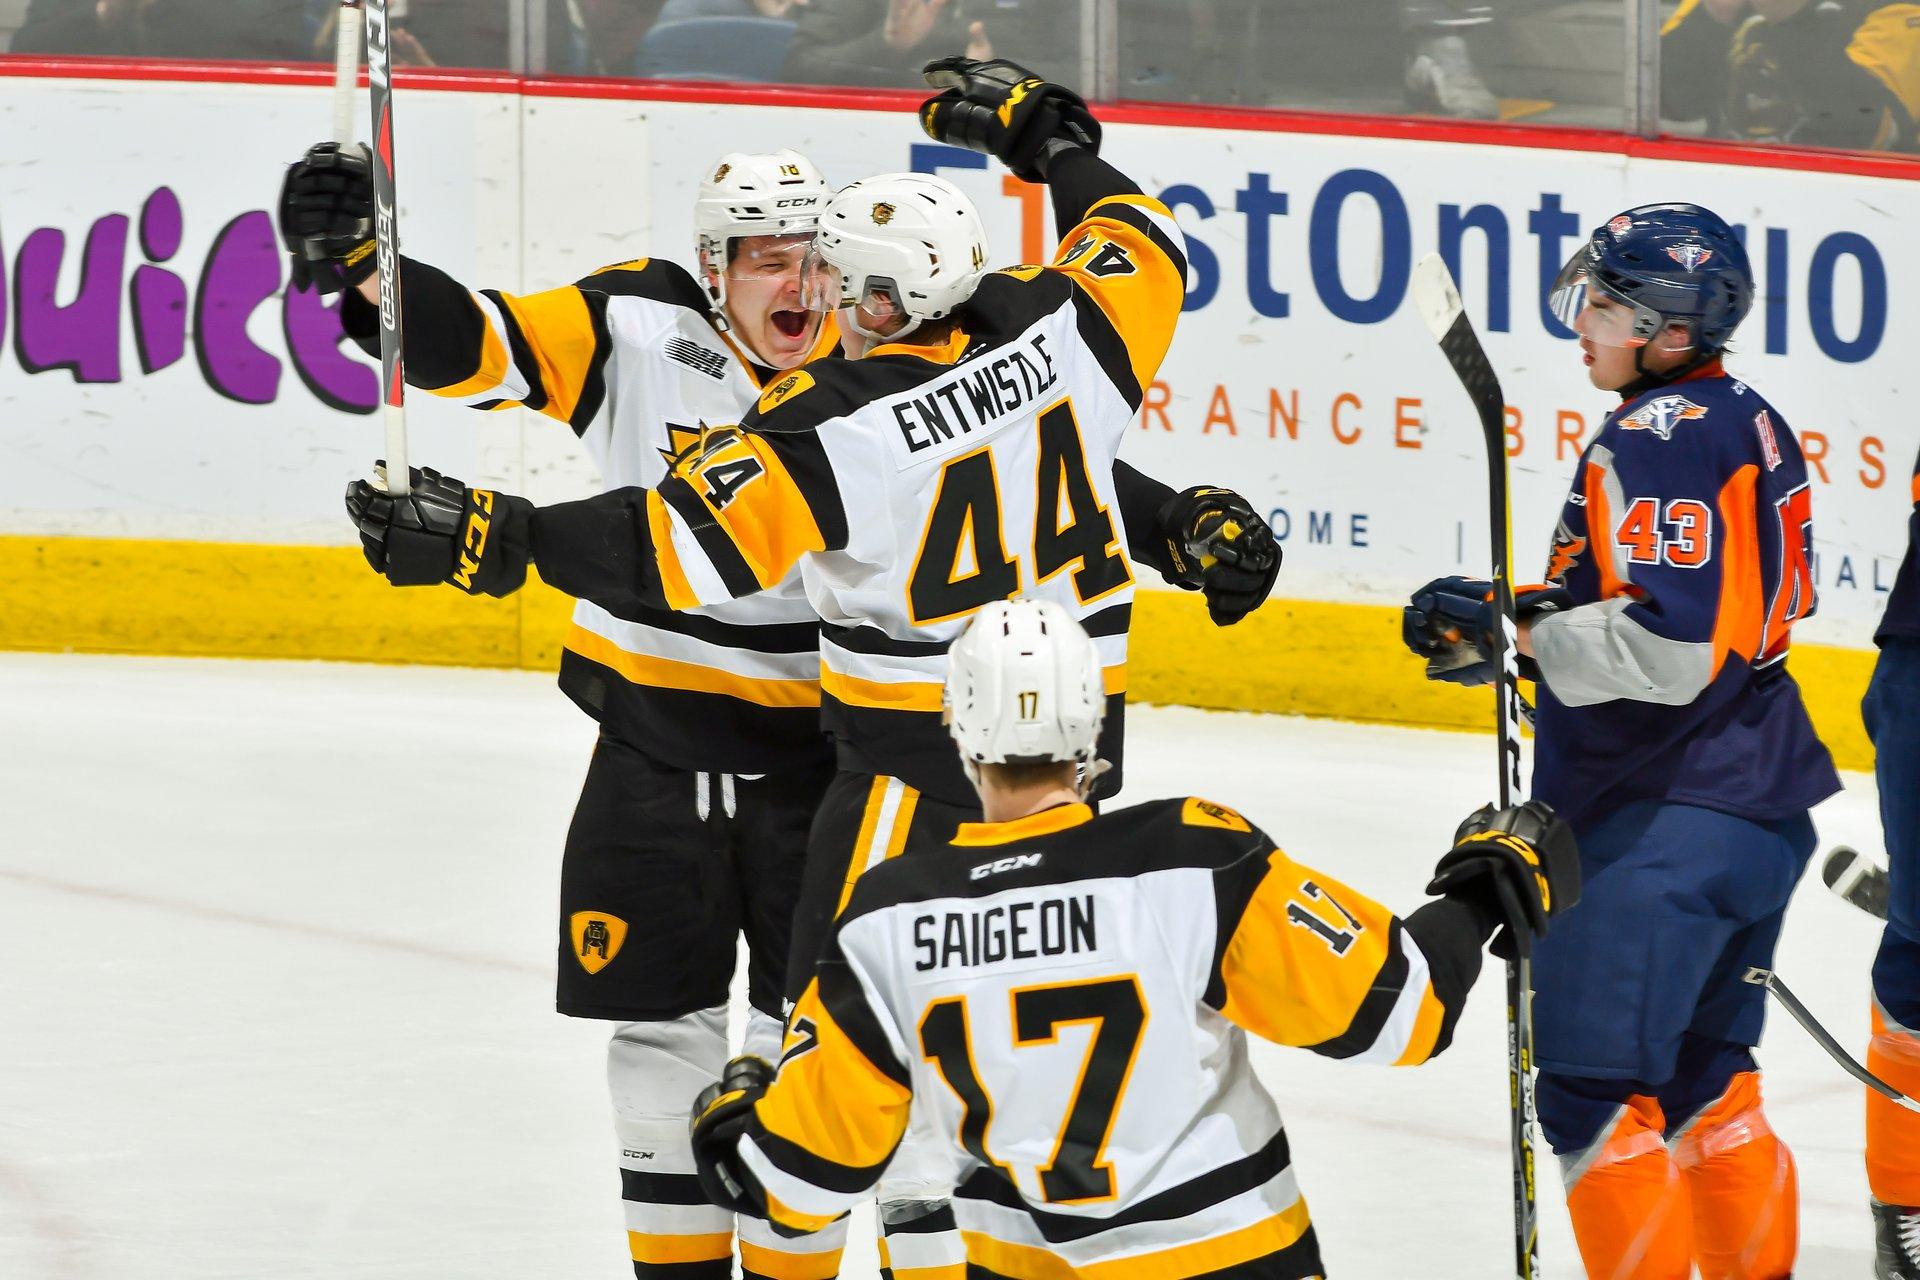 Hamilton Bulldogs Centre Ice